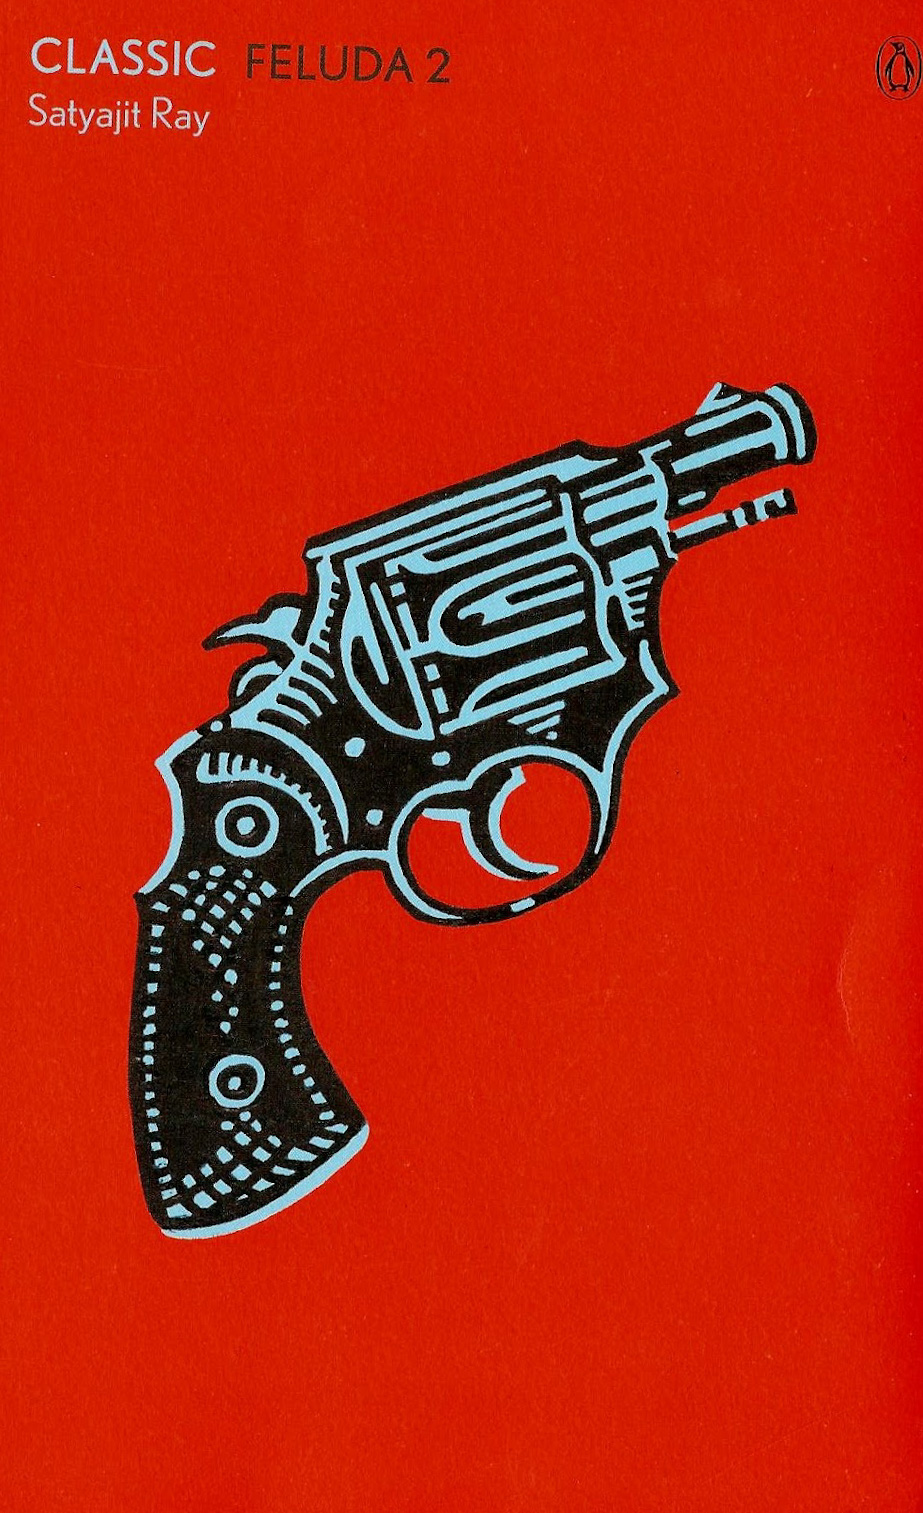 Feluda: The Common Man's Detective